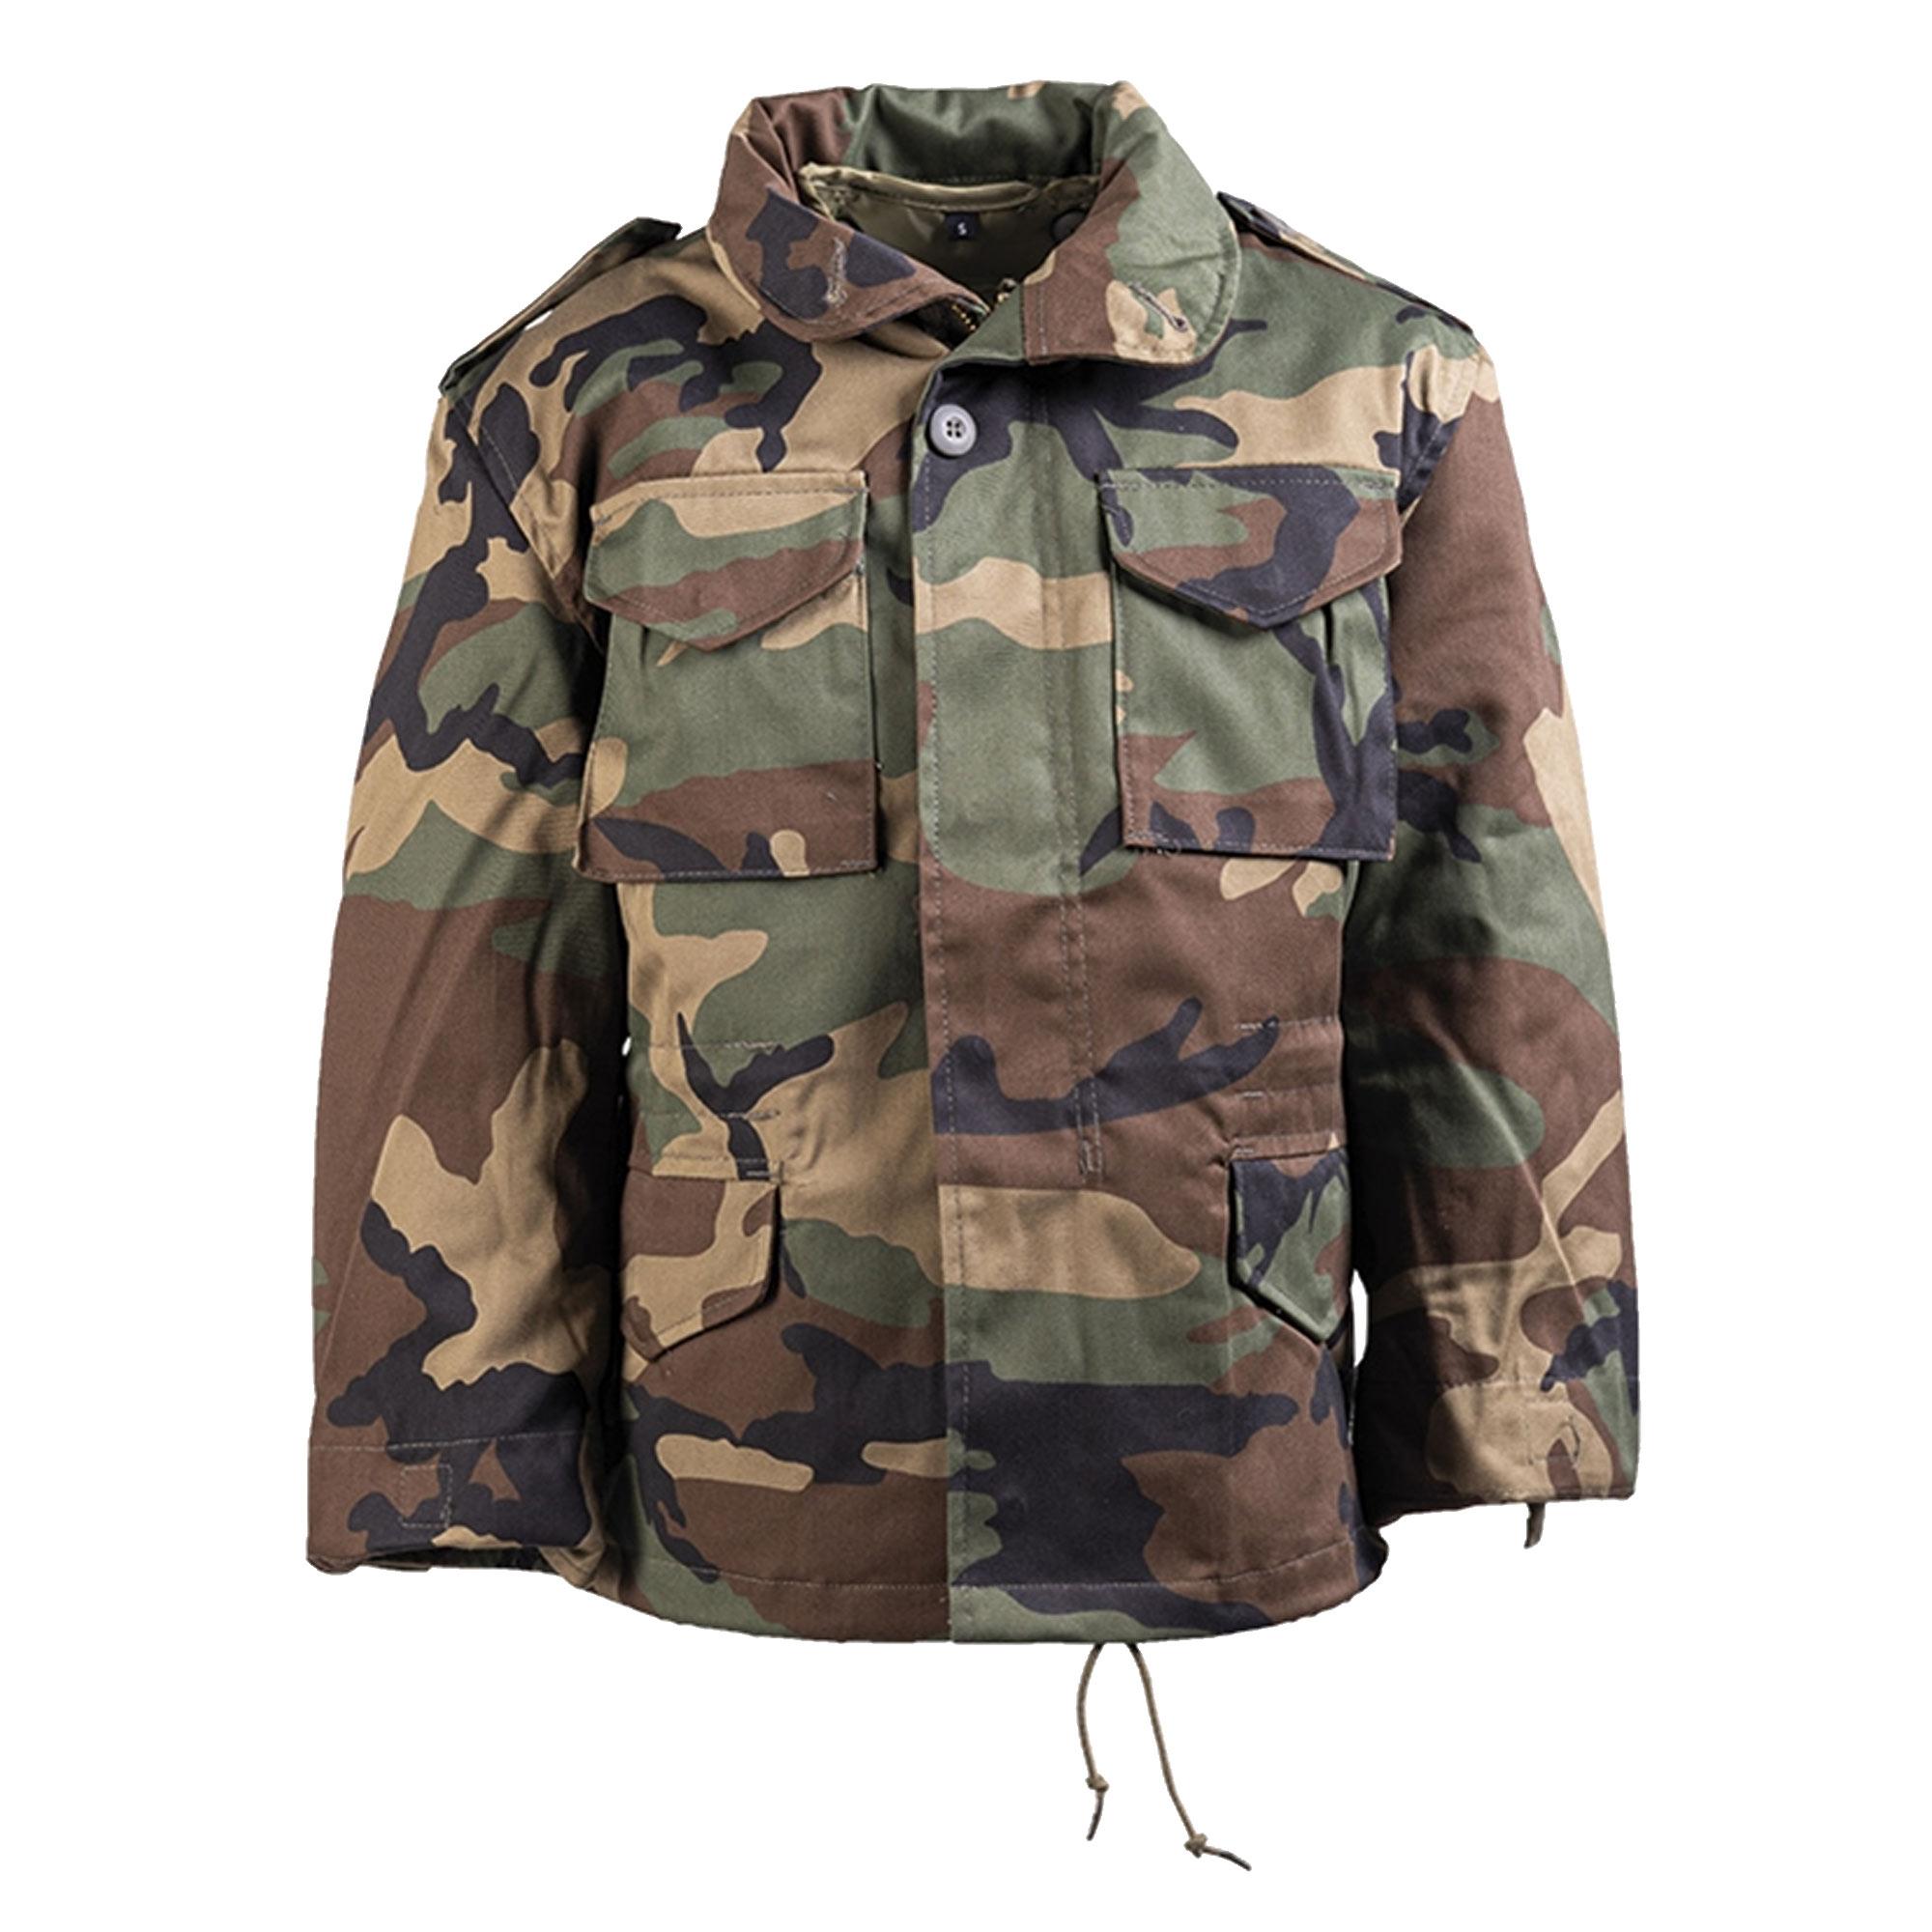 Kids Field Jacket M-65 Style woodland